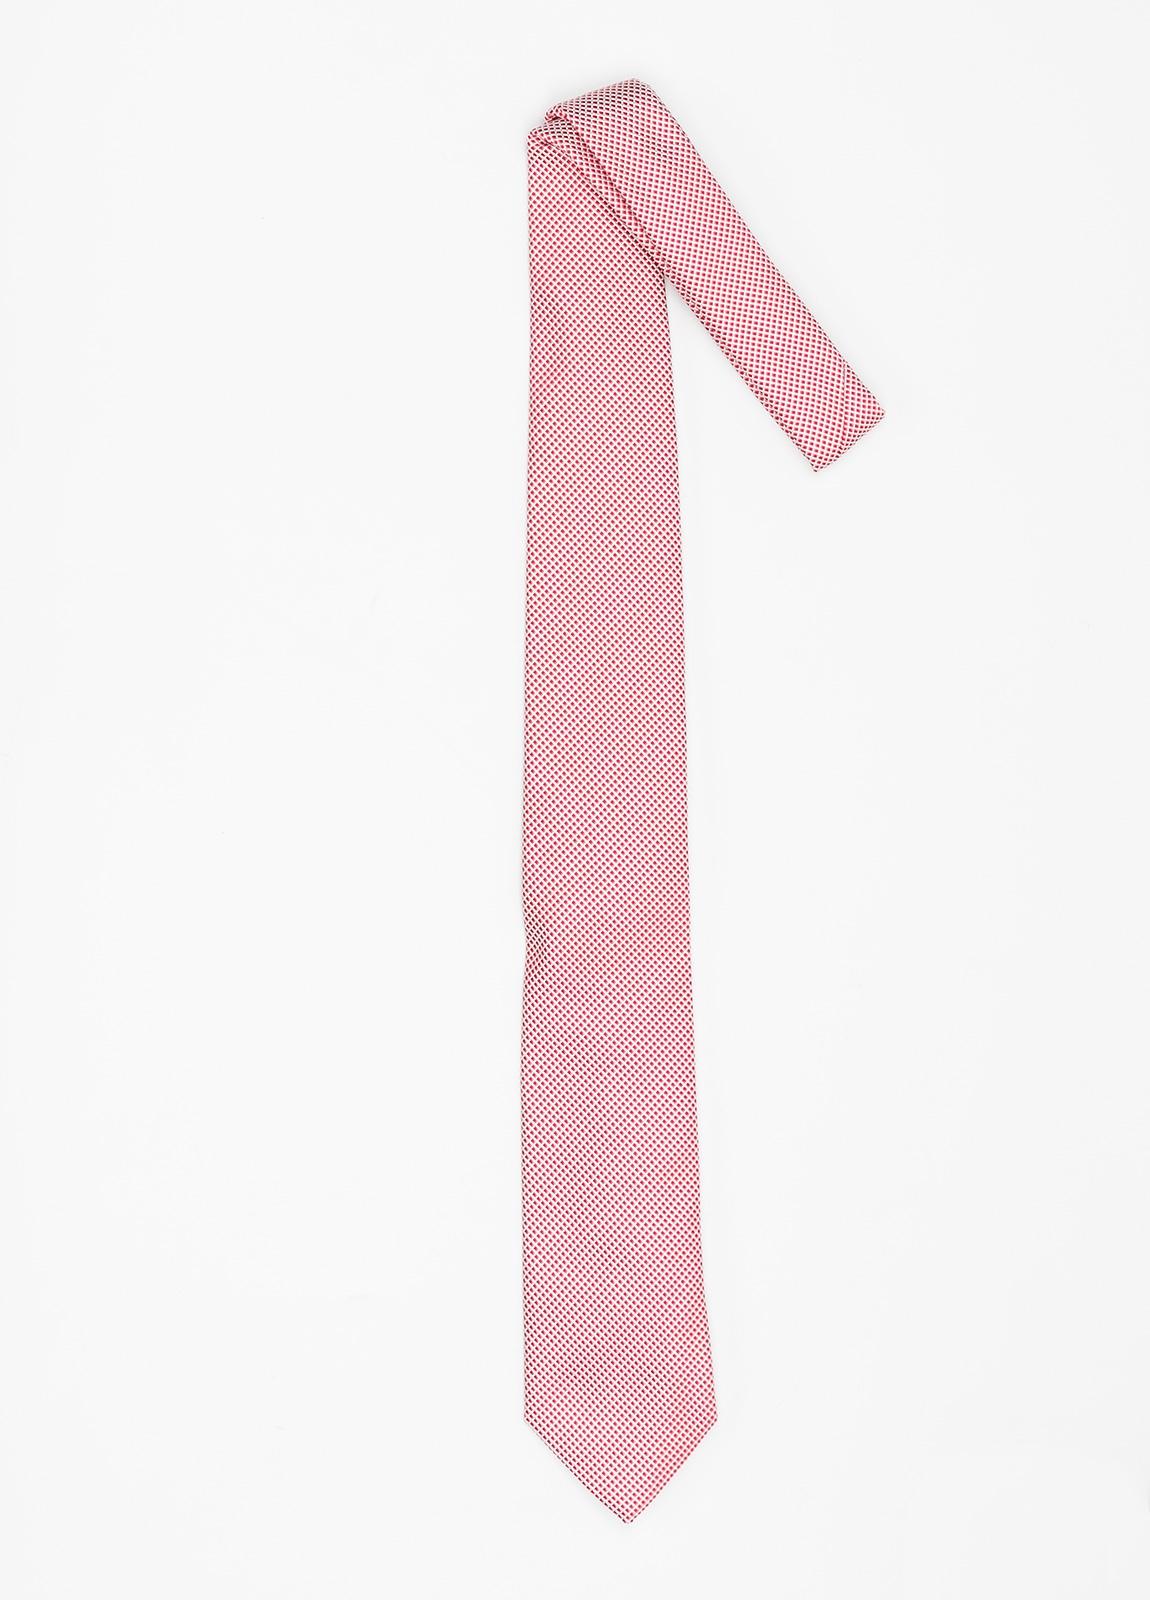 Corbata Formal Wear micro dibujo color rojo. Pala 7,5 cm. 100% Seda. - Ítem1